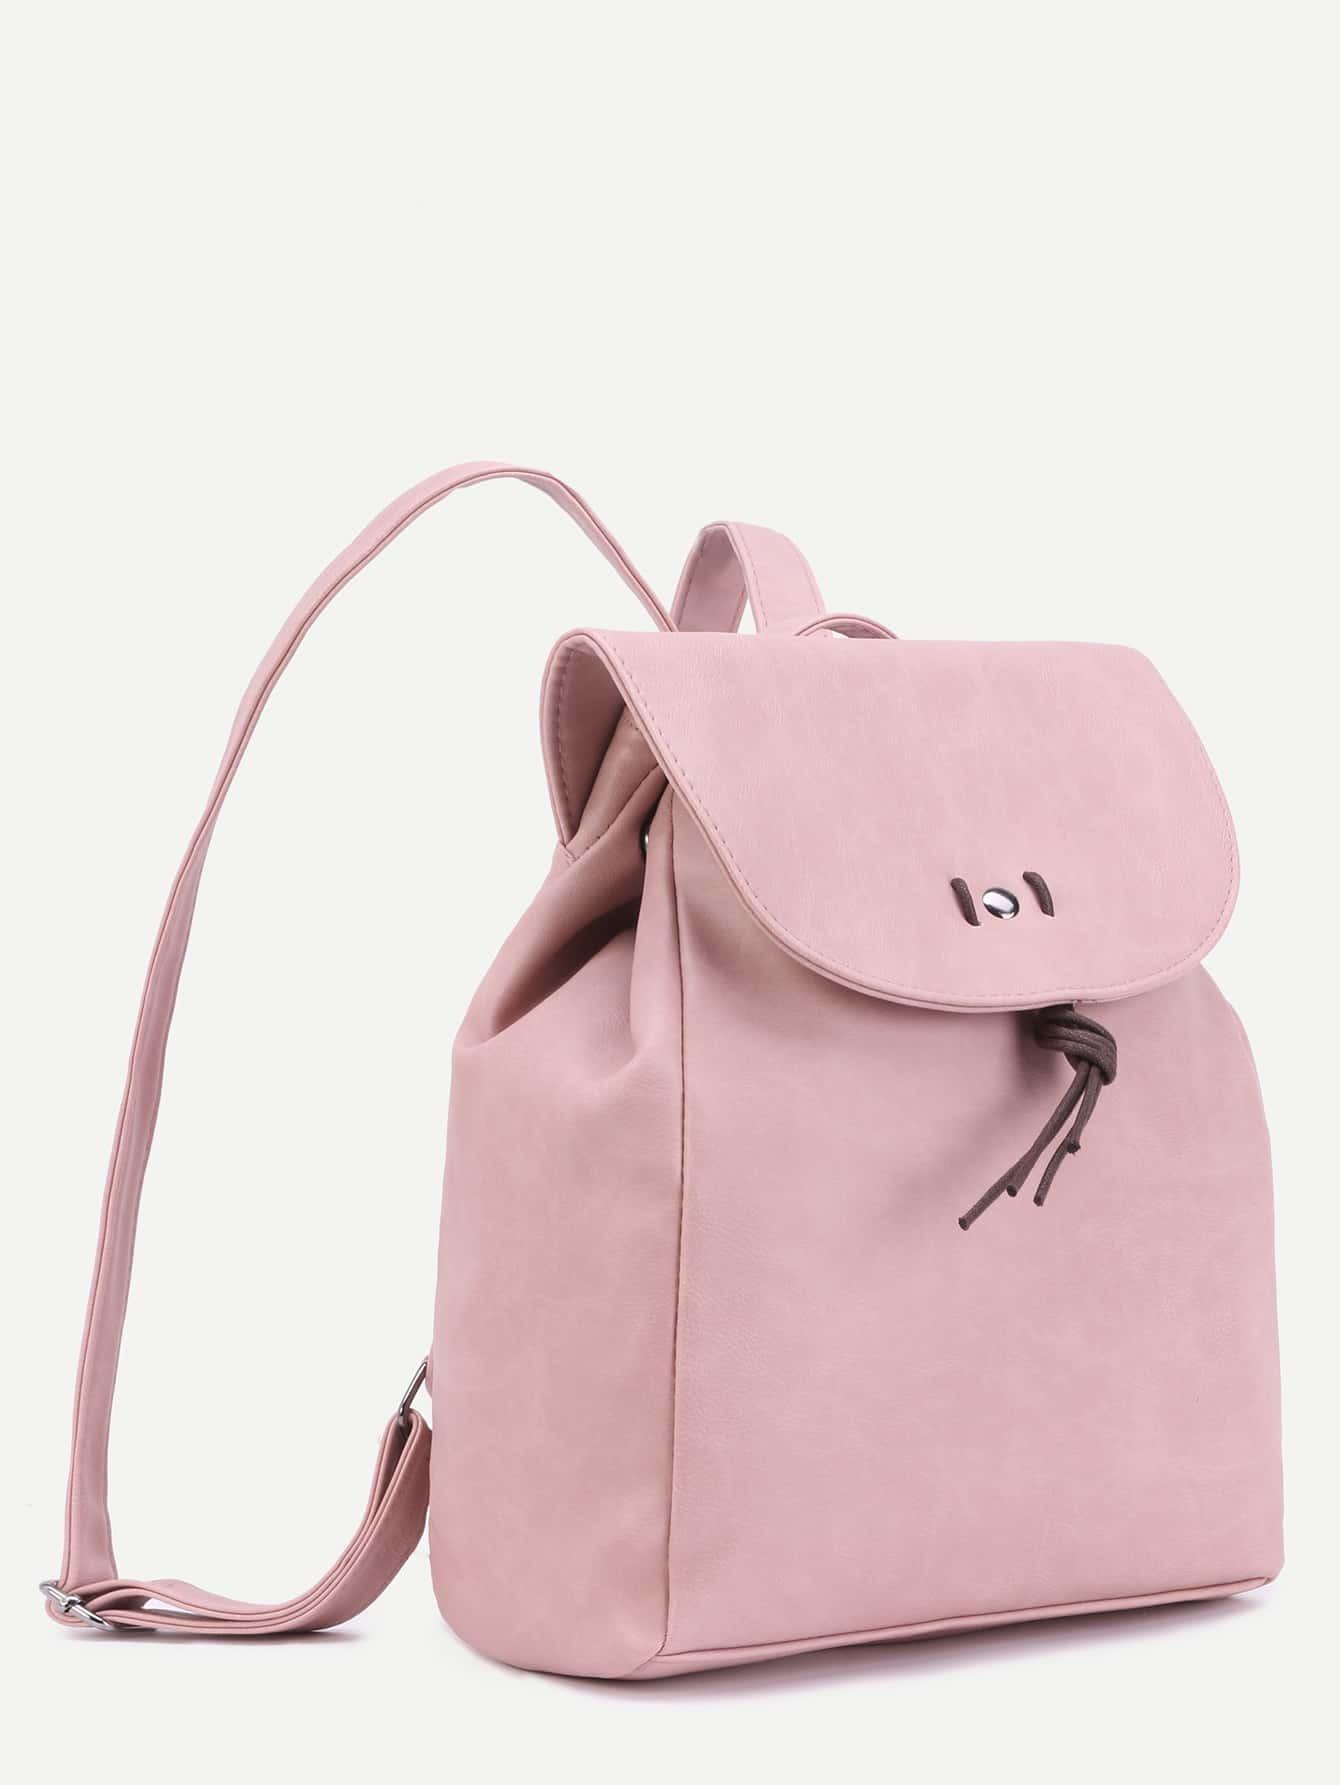 bag161003917_2